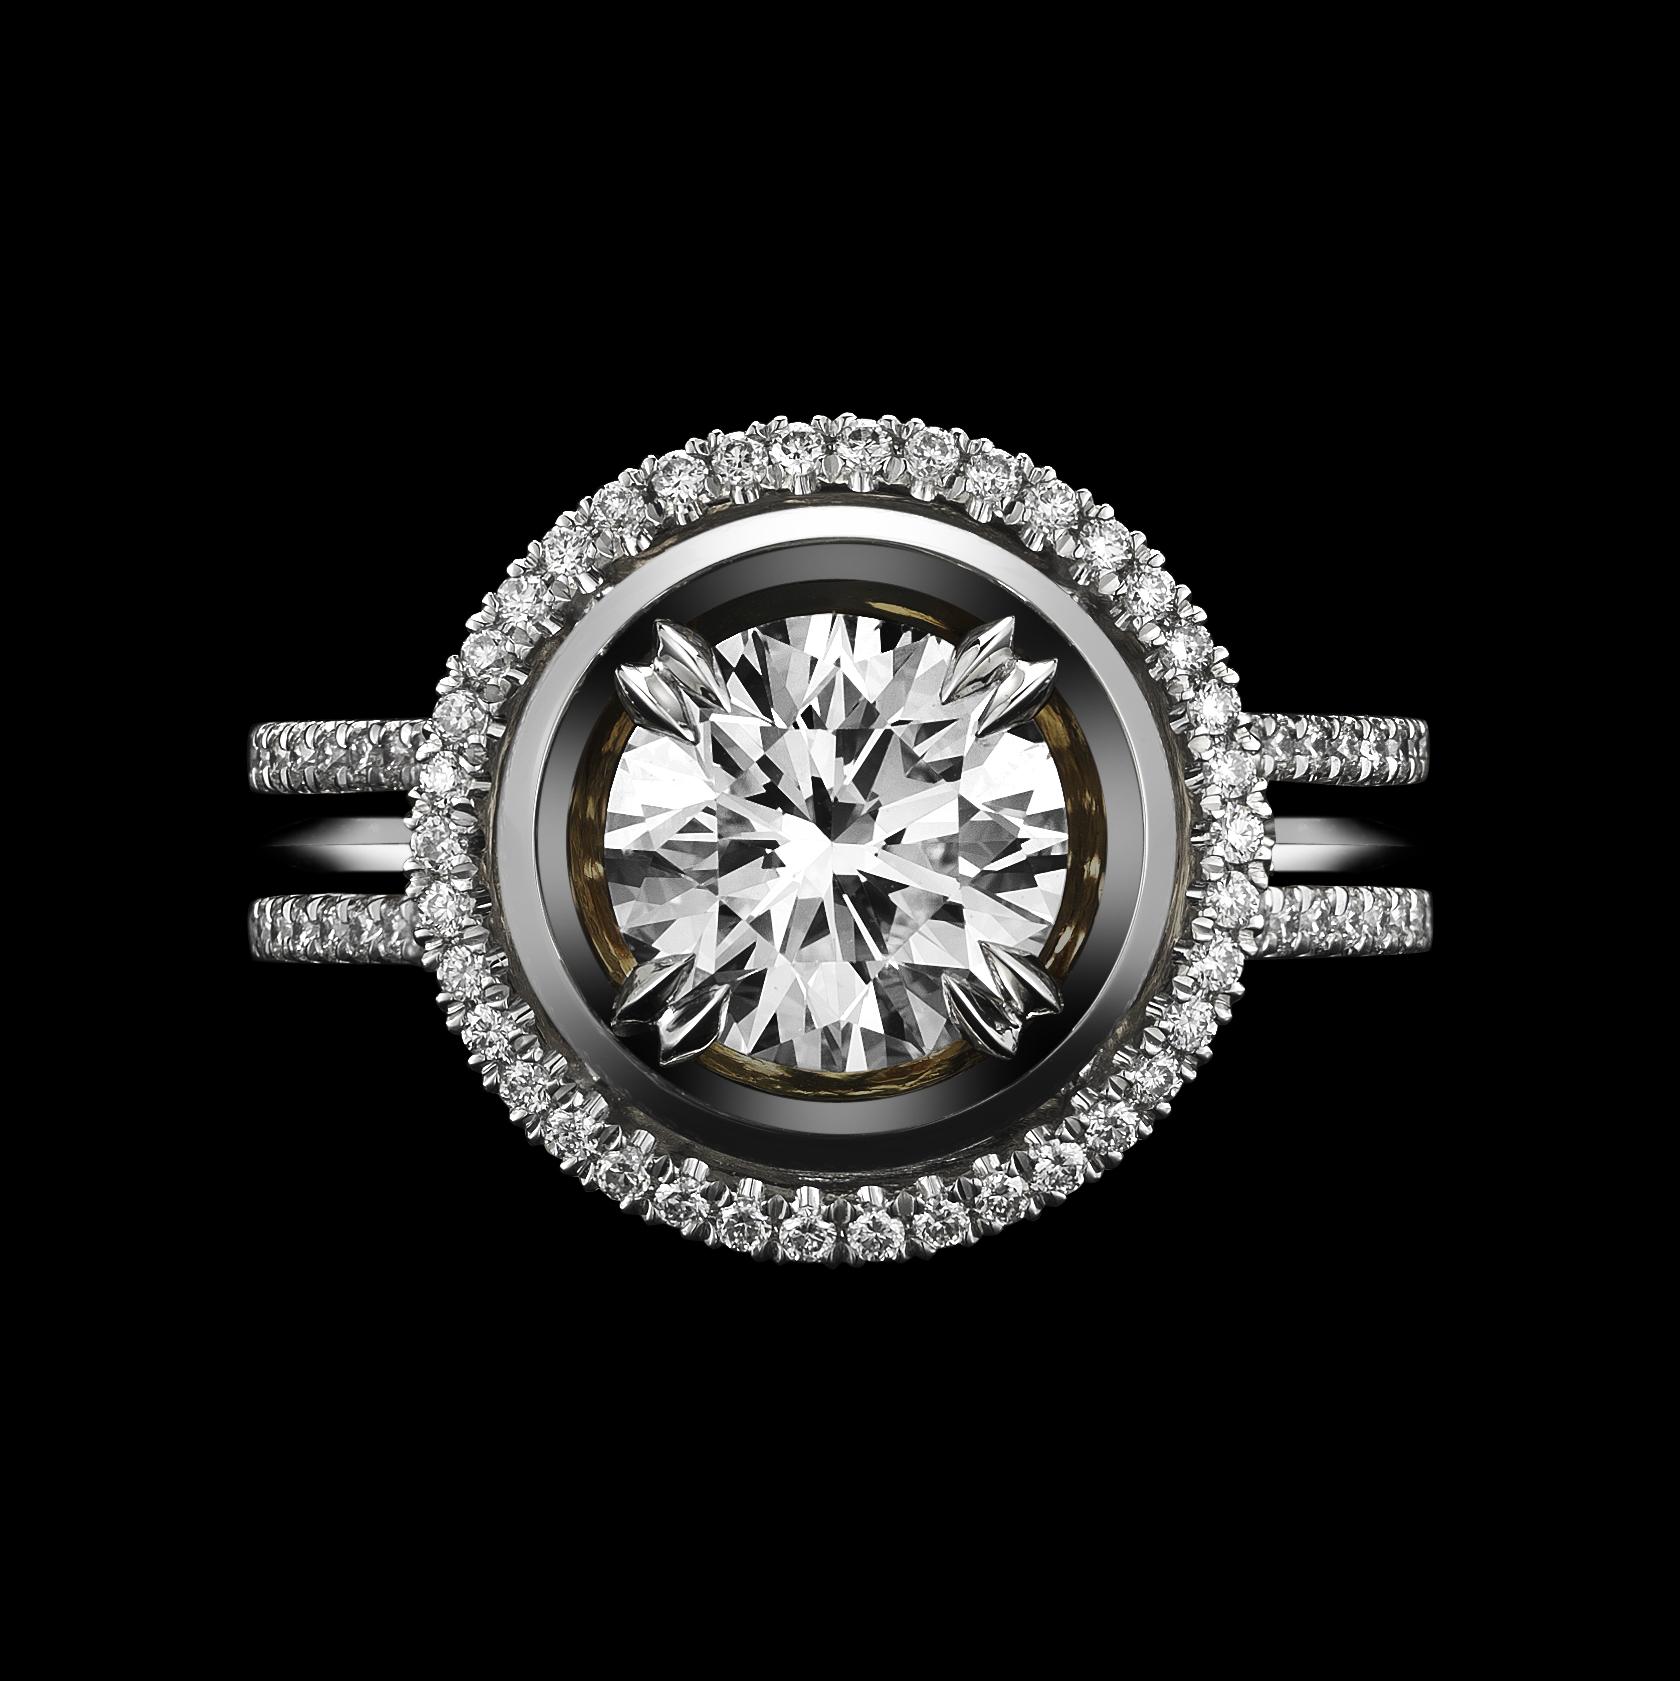 Ring Diamond Halo Round Brilliant Cut_AMRG1055_A.jpg